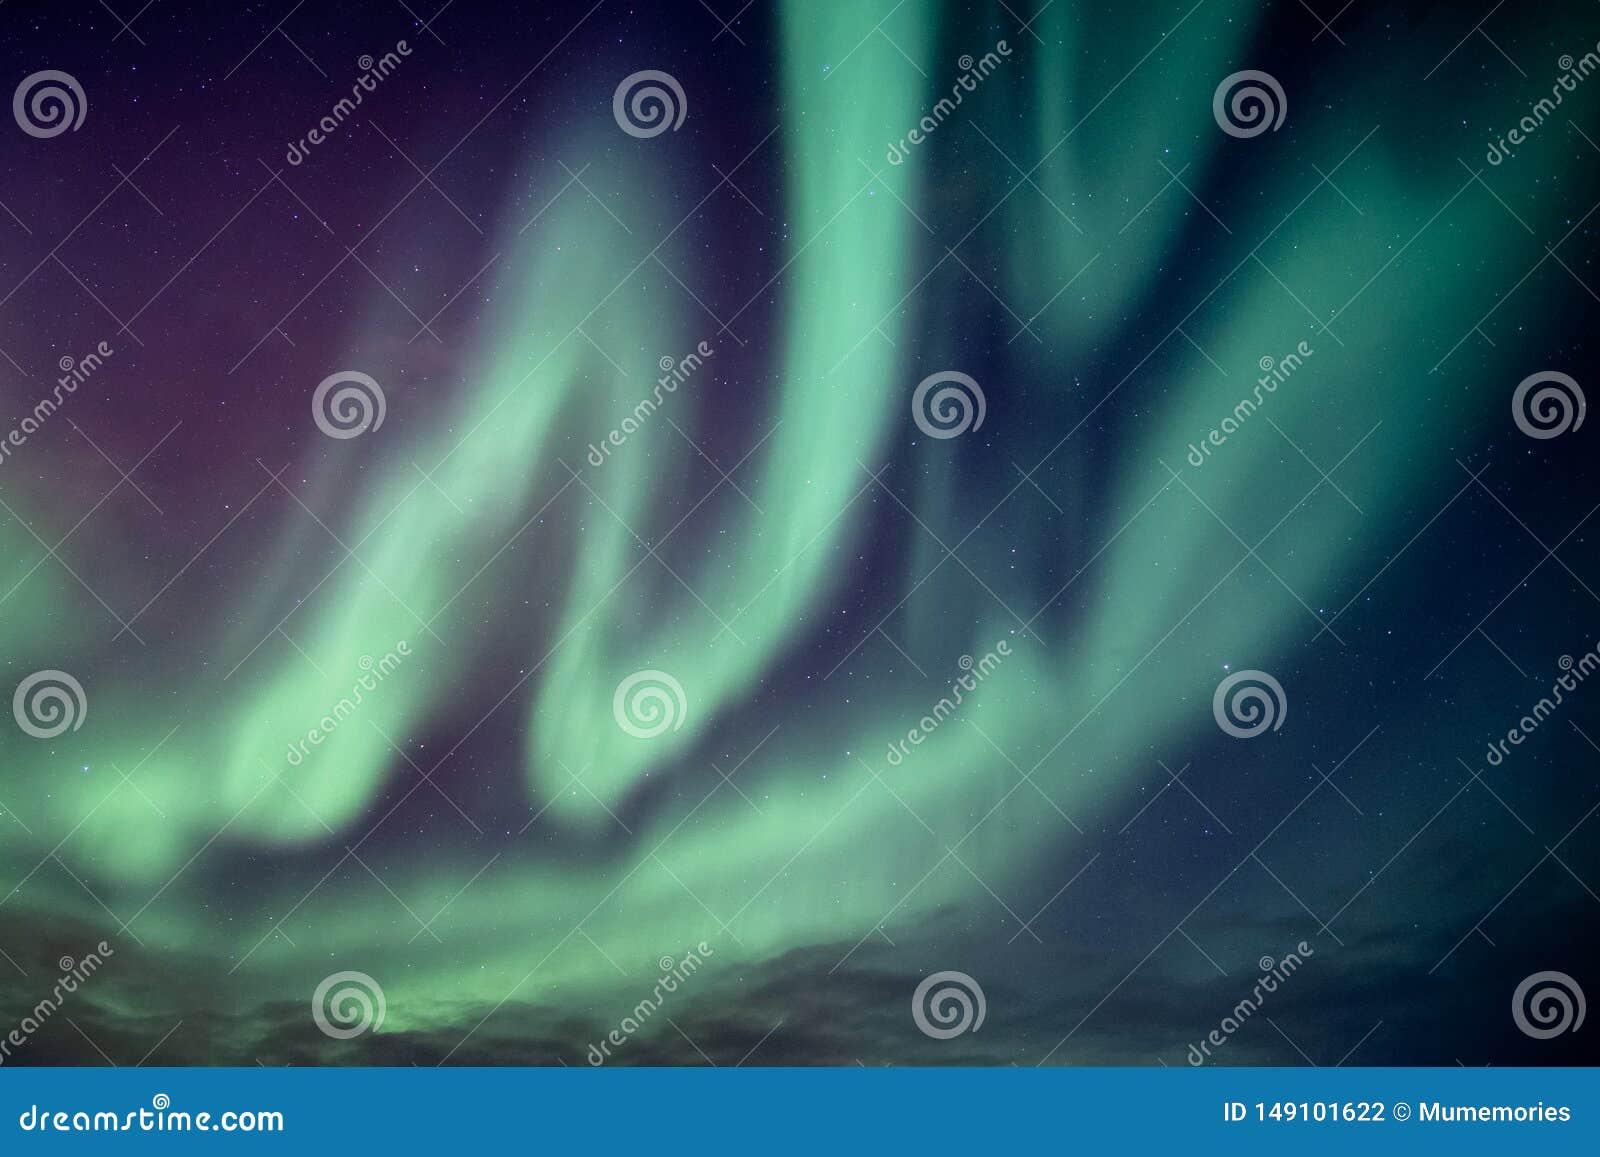 Beautiful northern lights or aurora borealis explosion